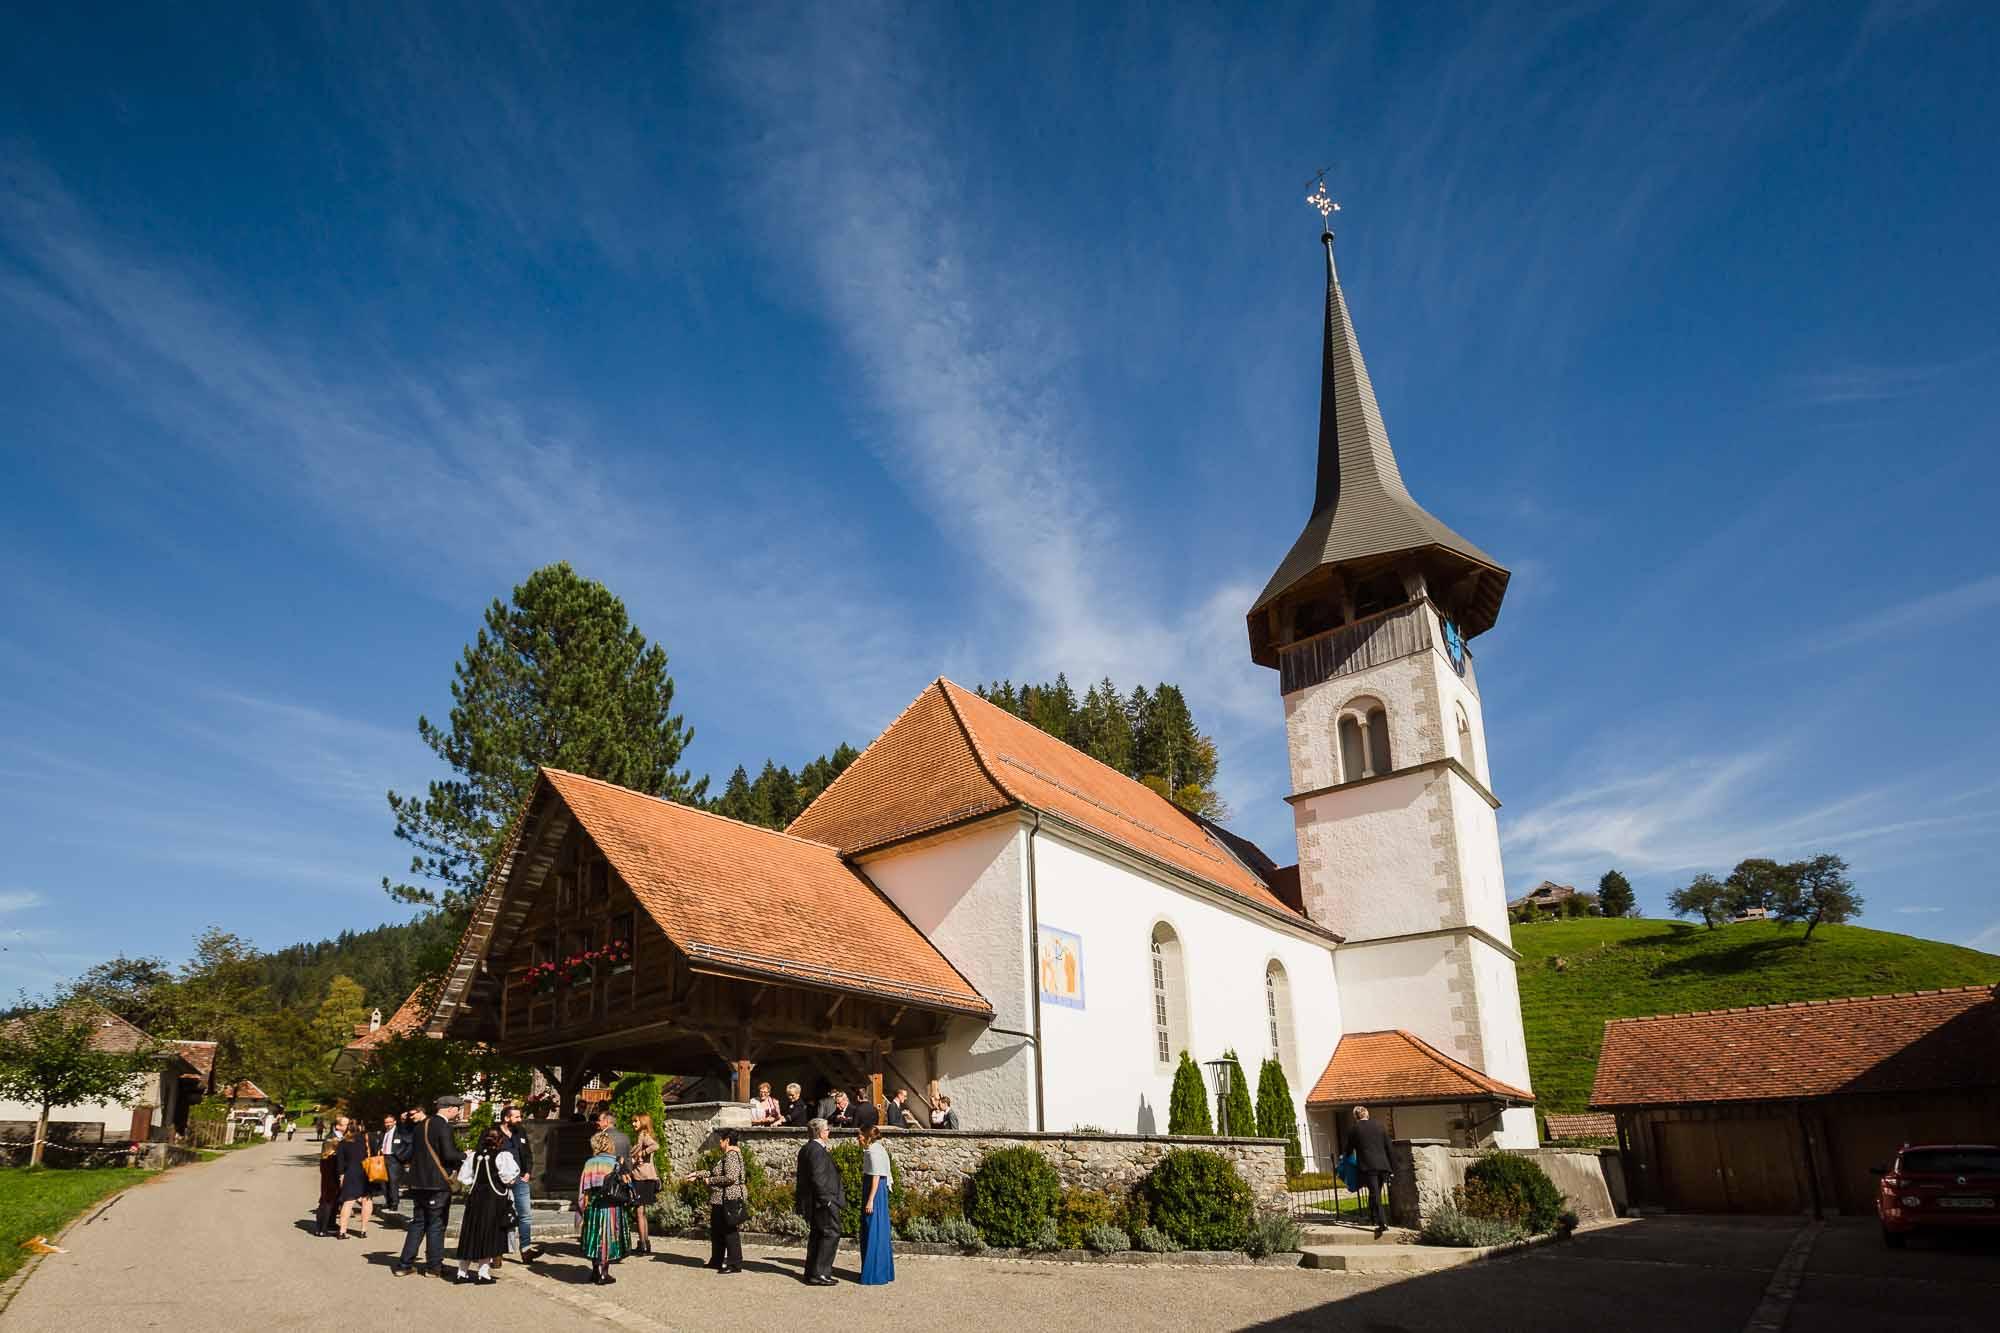 Kirche Trub Hochzeit